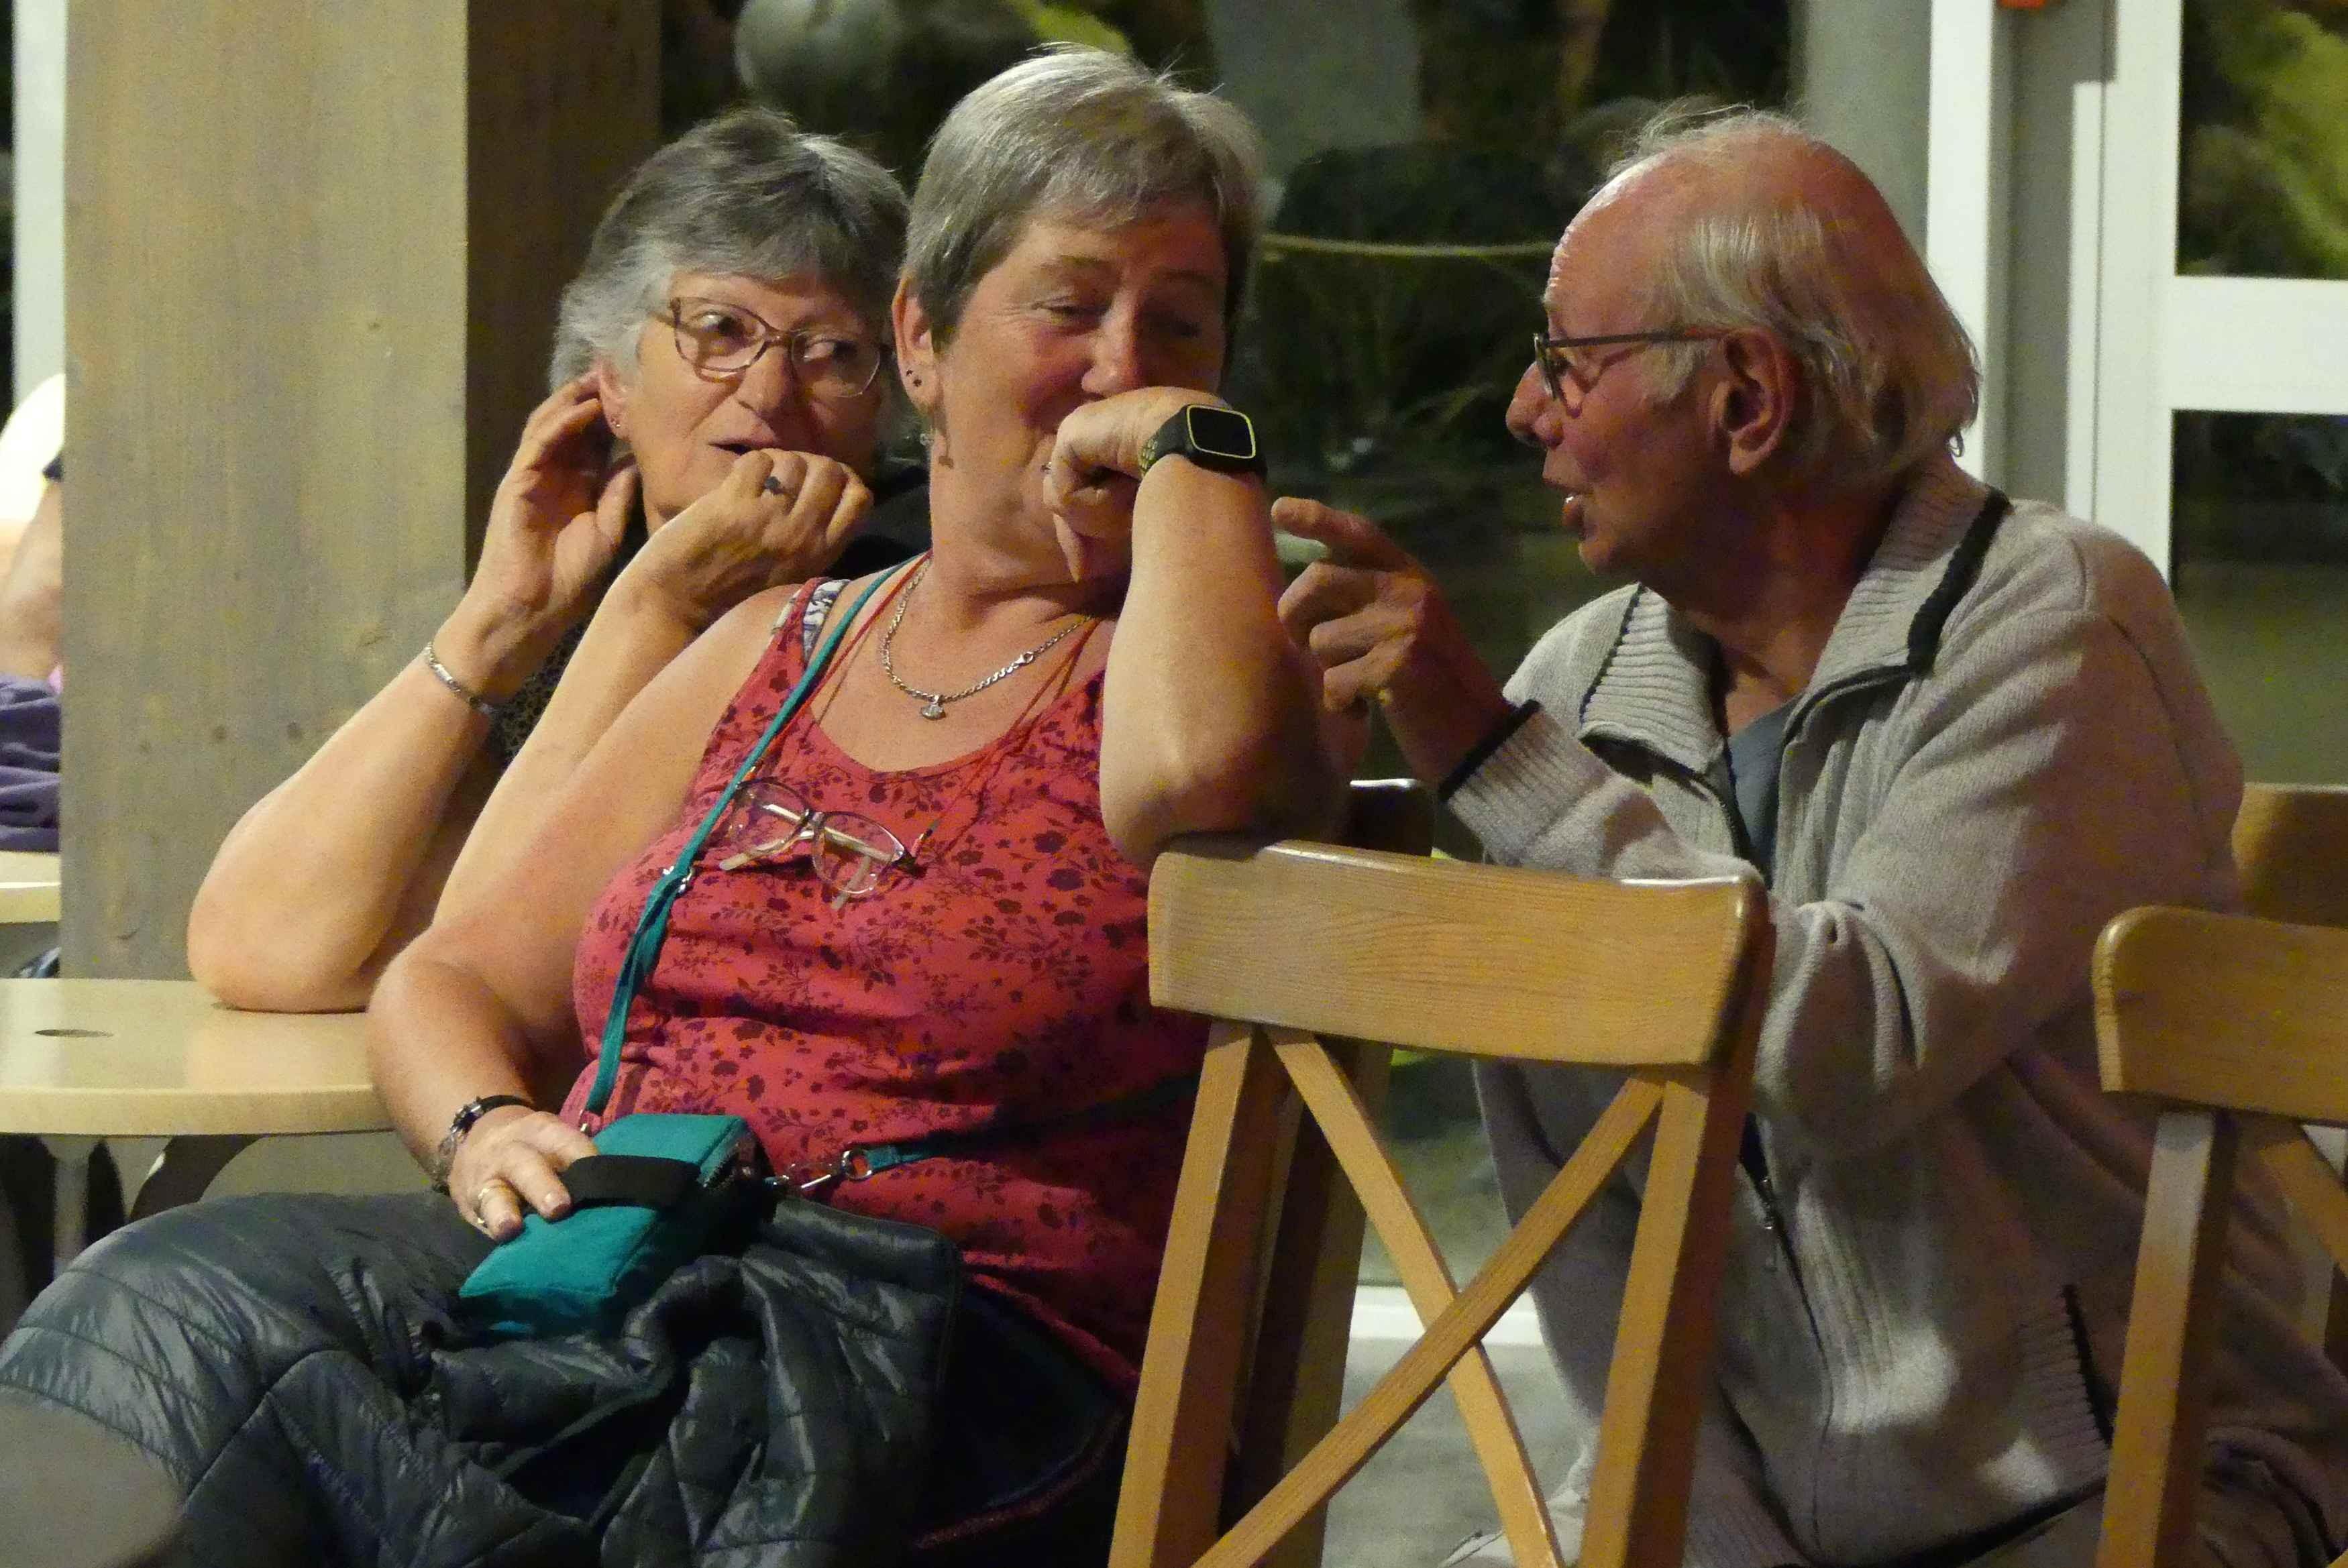 2020 09 13 0675 m soiree karaoke les tourelles normandie